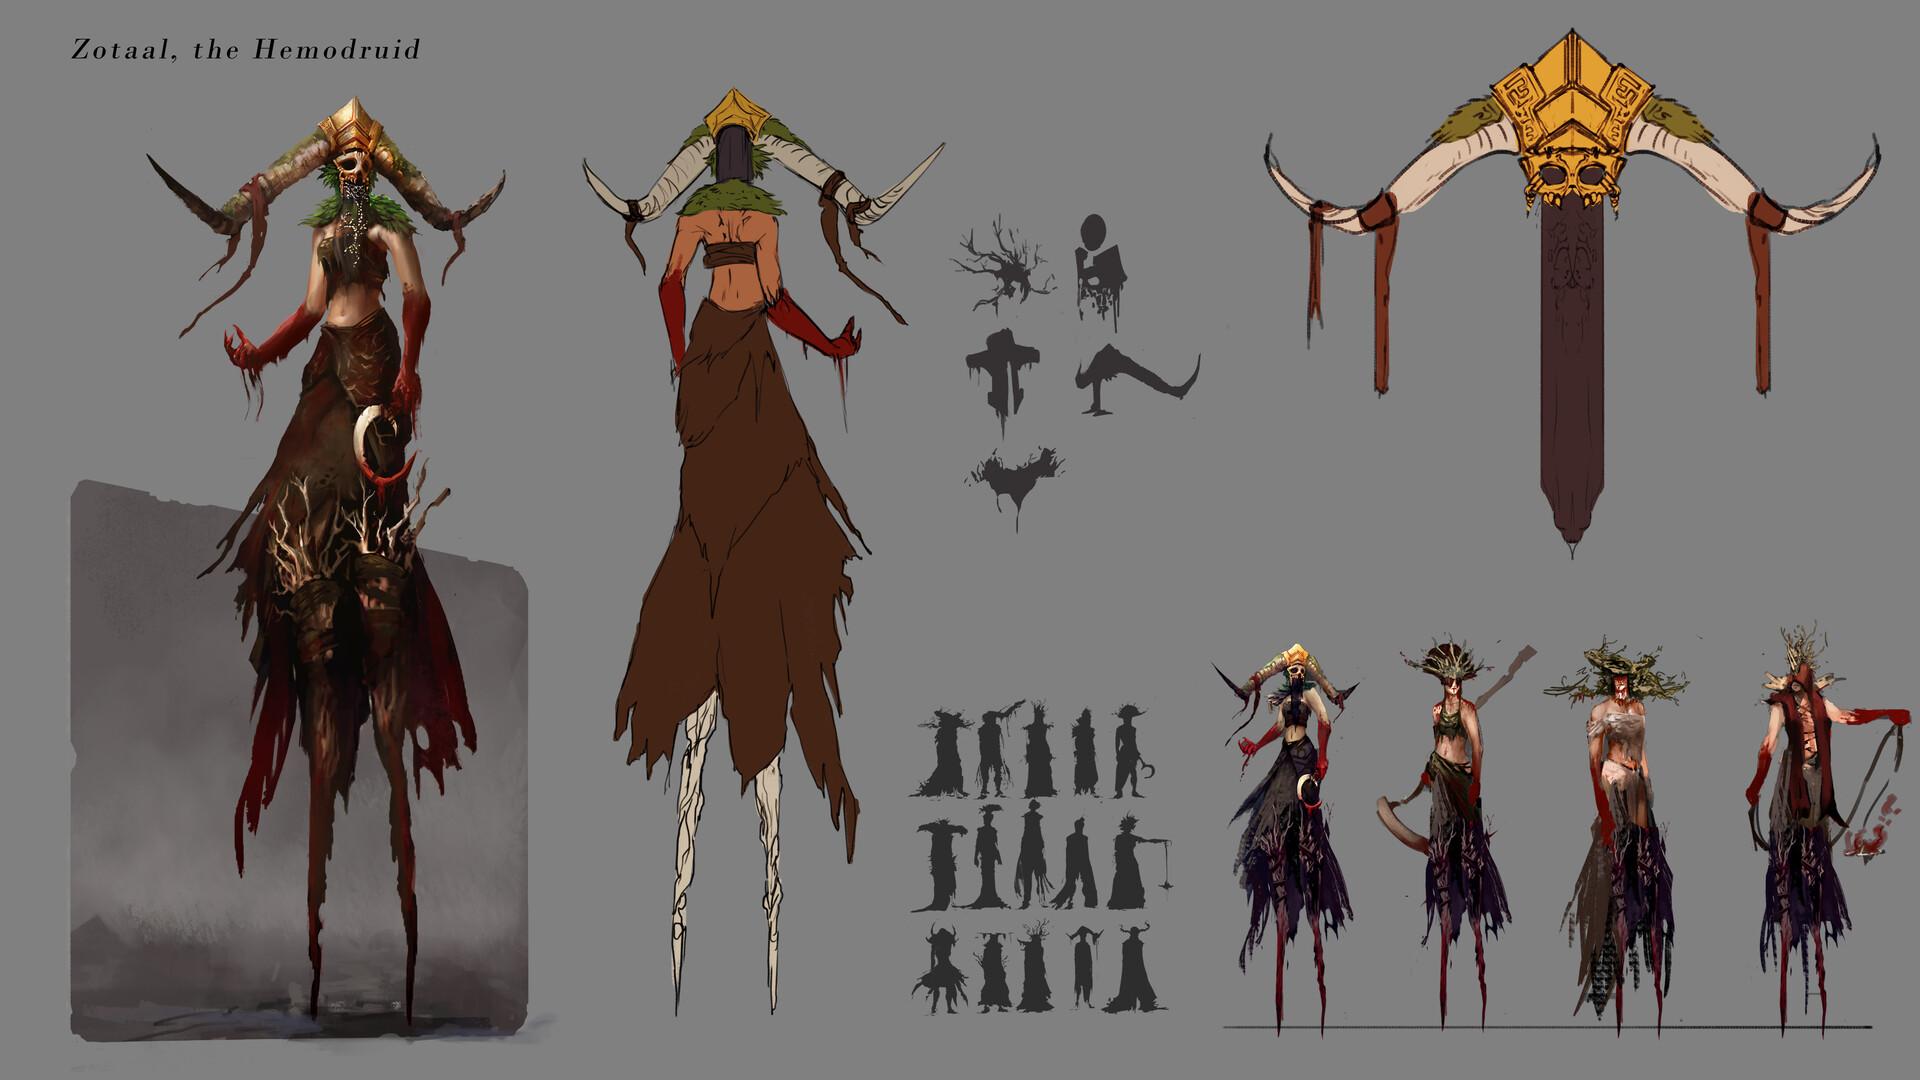 Zotaal, the Hemodruid